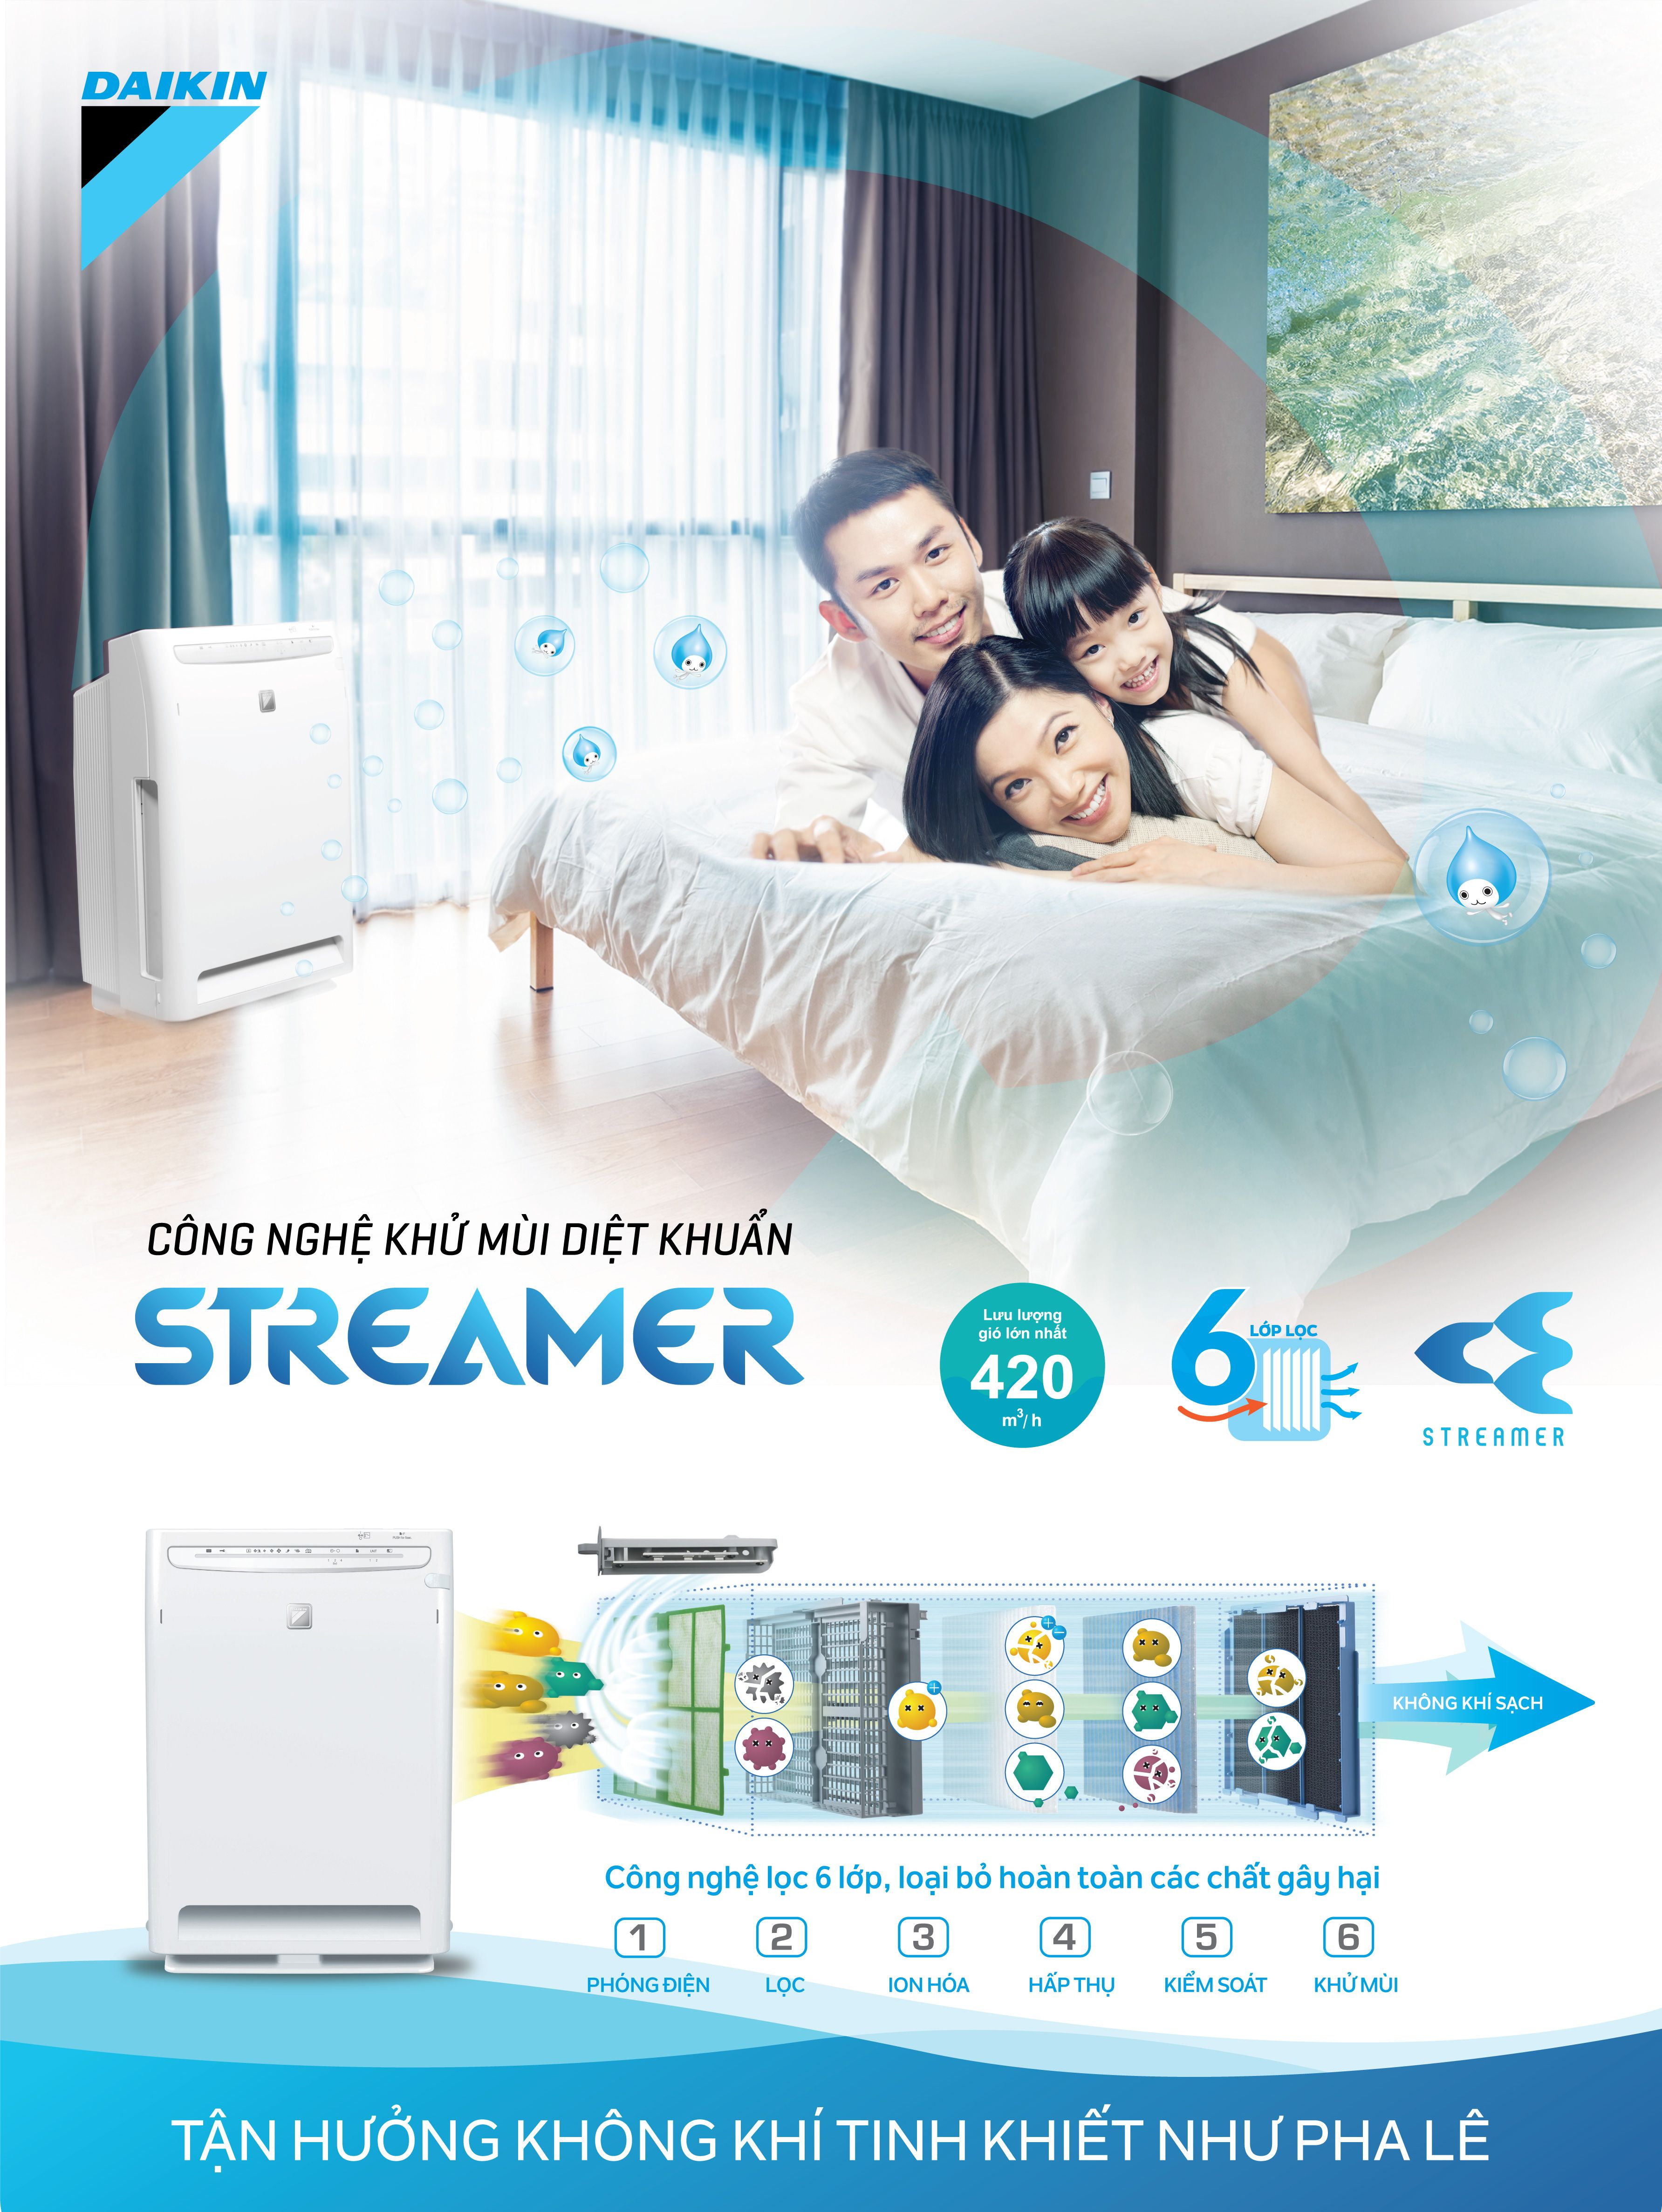 Air Purifier Poster 2016 Air purifier, Toddler bed, Purifier